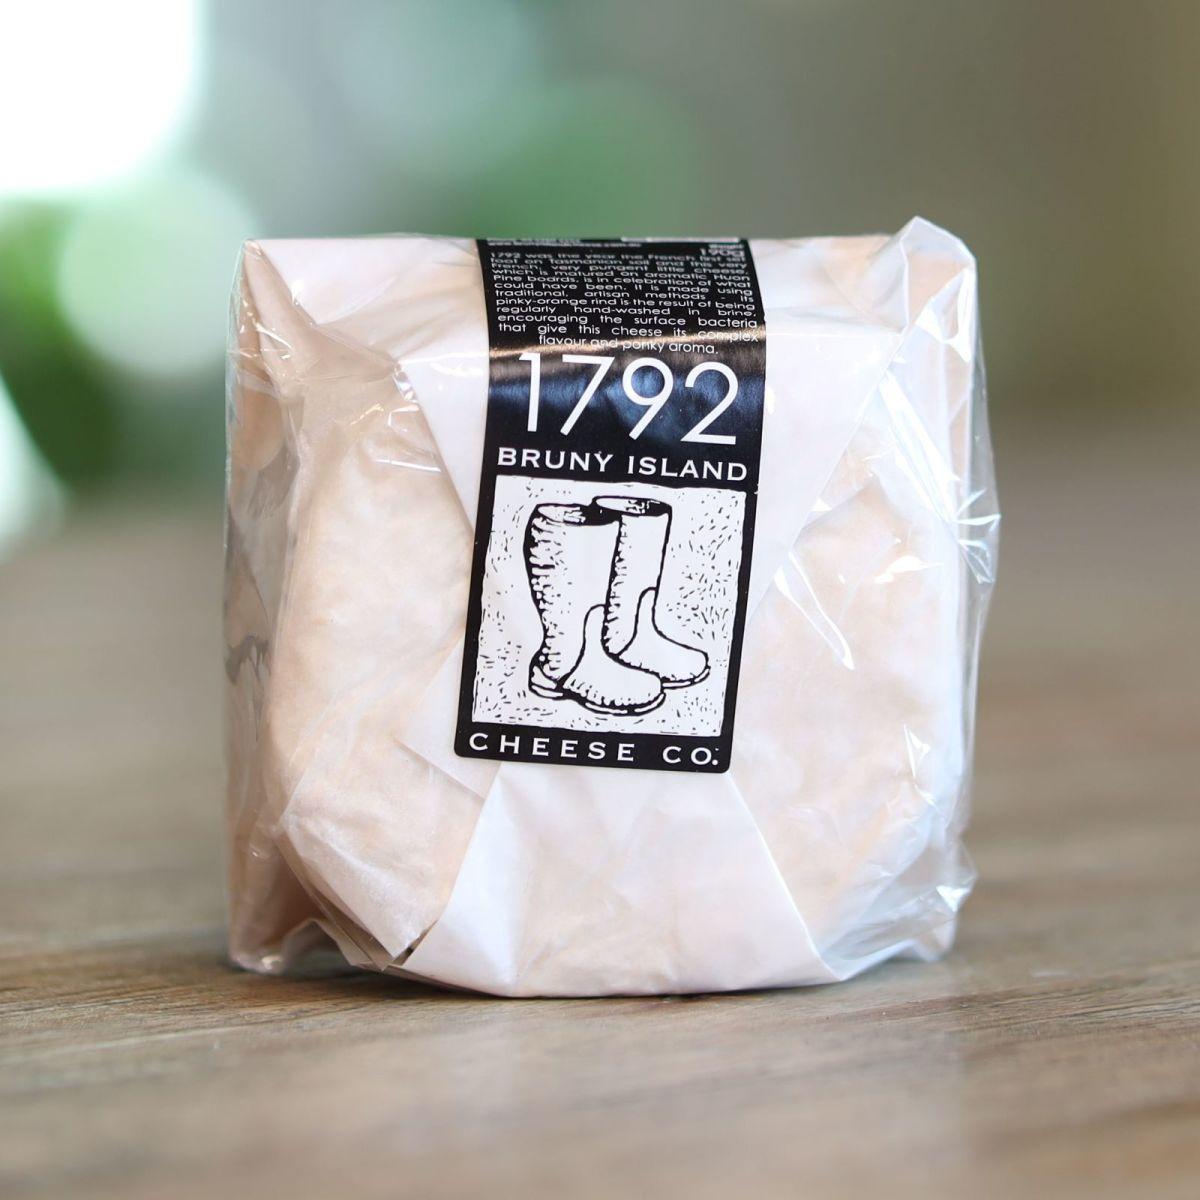 Bruny Island Cheese Co. 1972